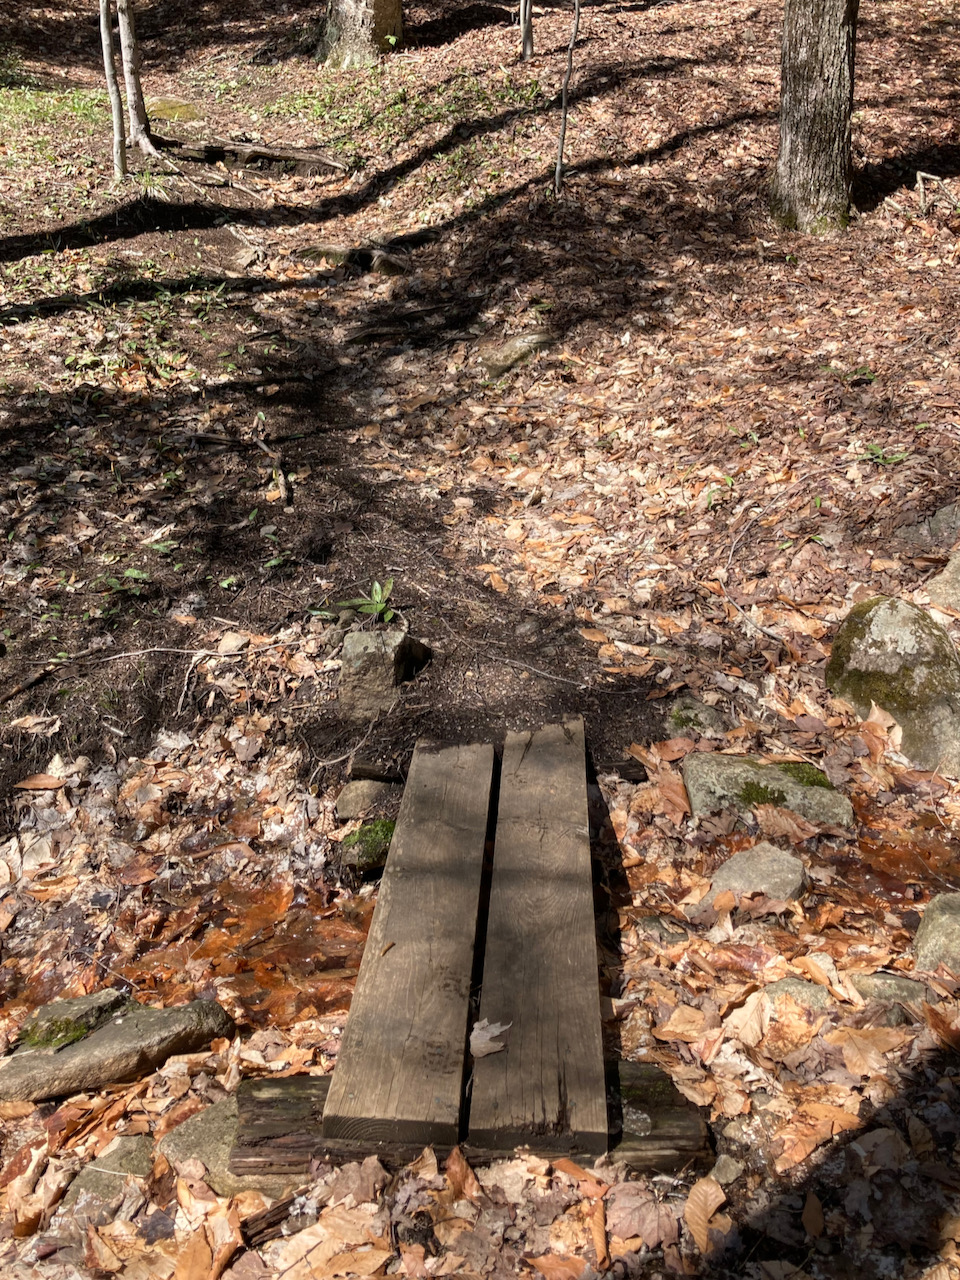 Small bridge over tiny stream in ground.